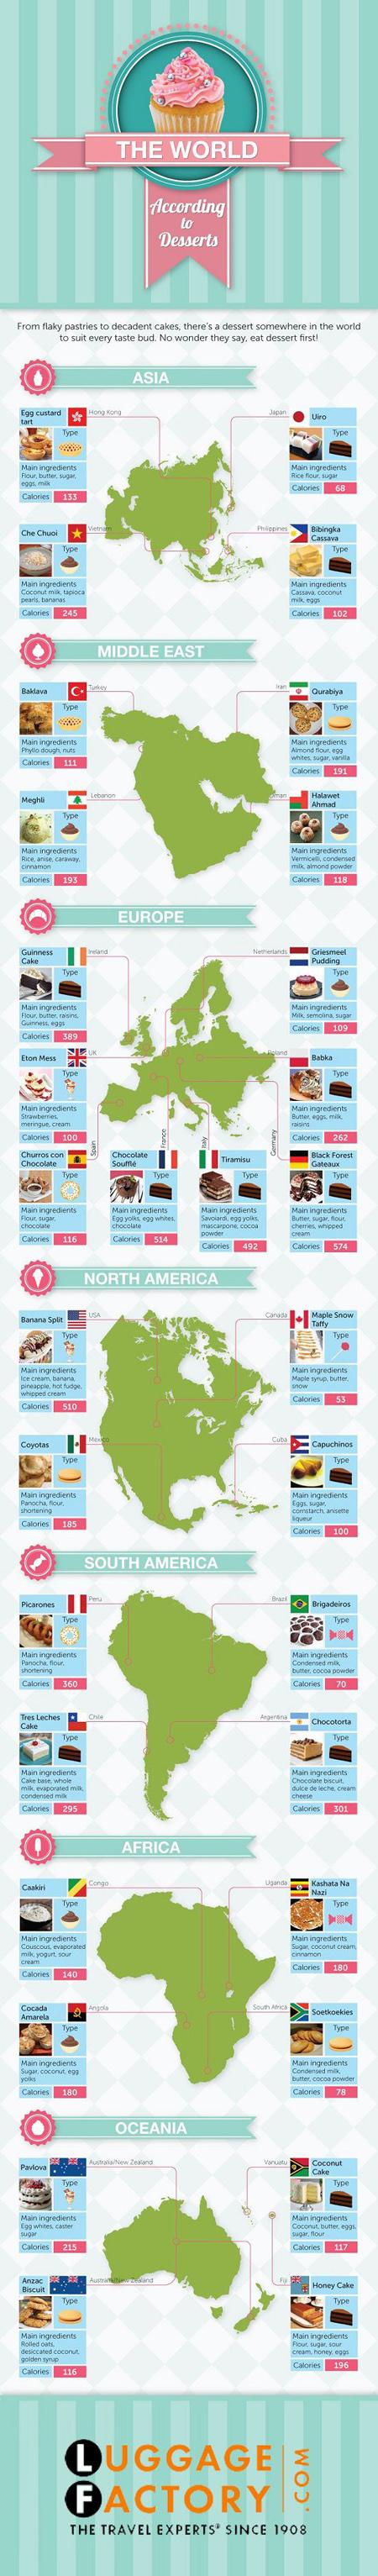 Tour du monde gourmand